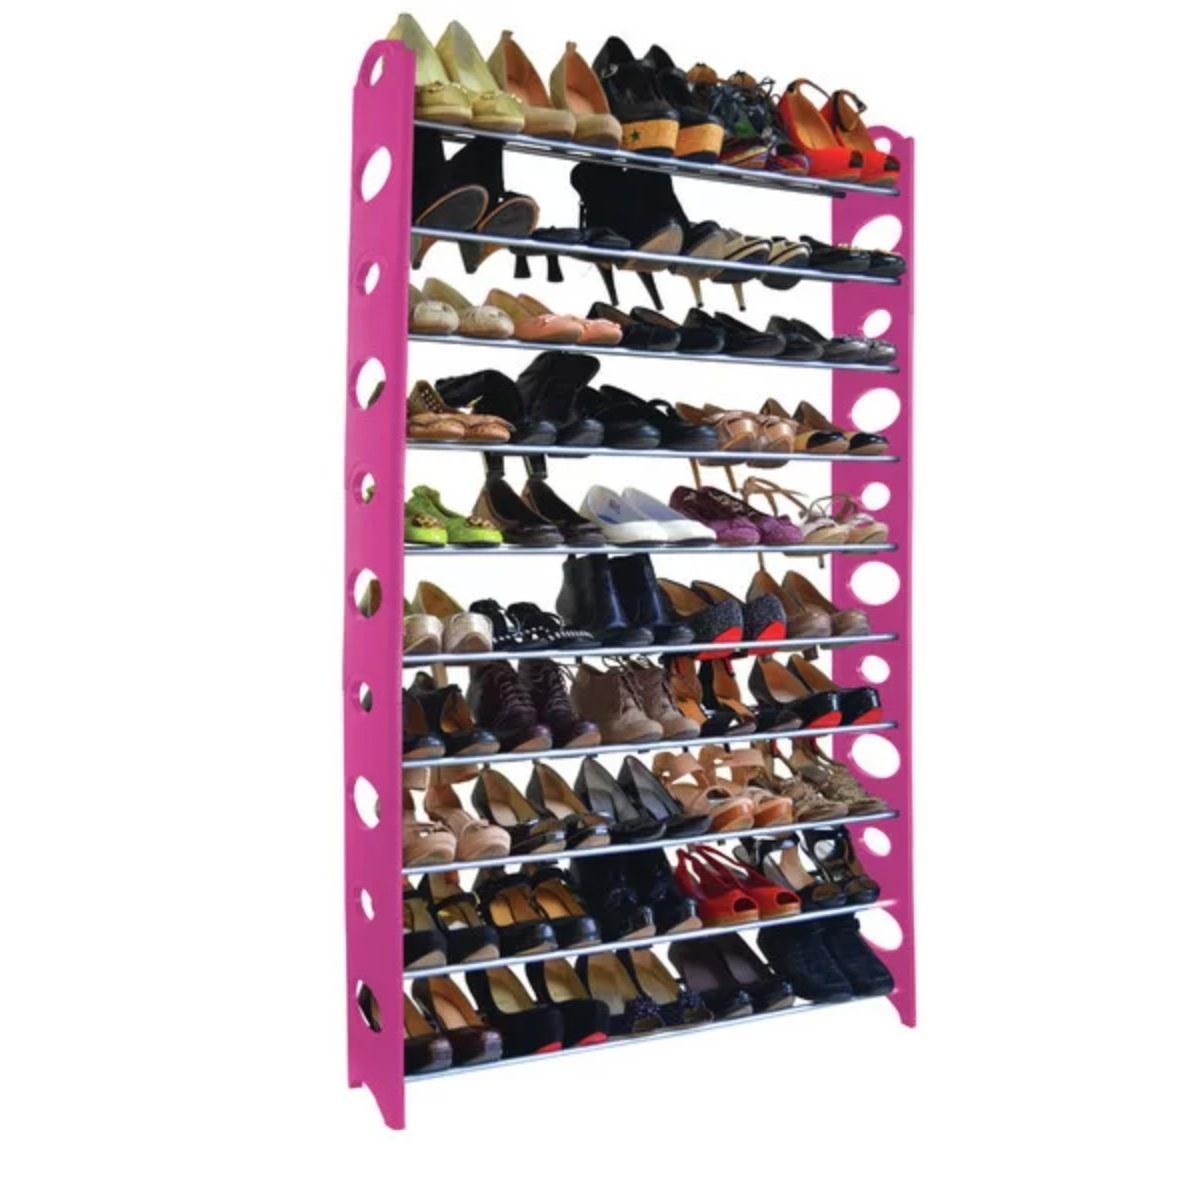 The tall shoe rack